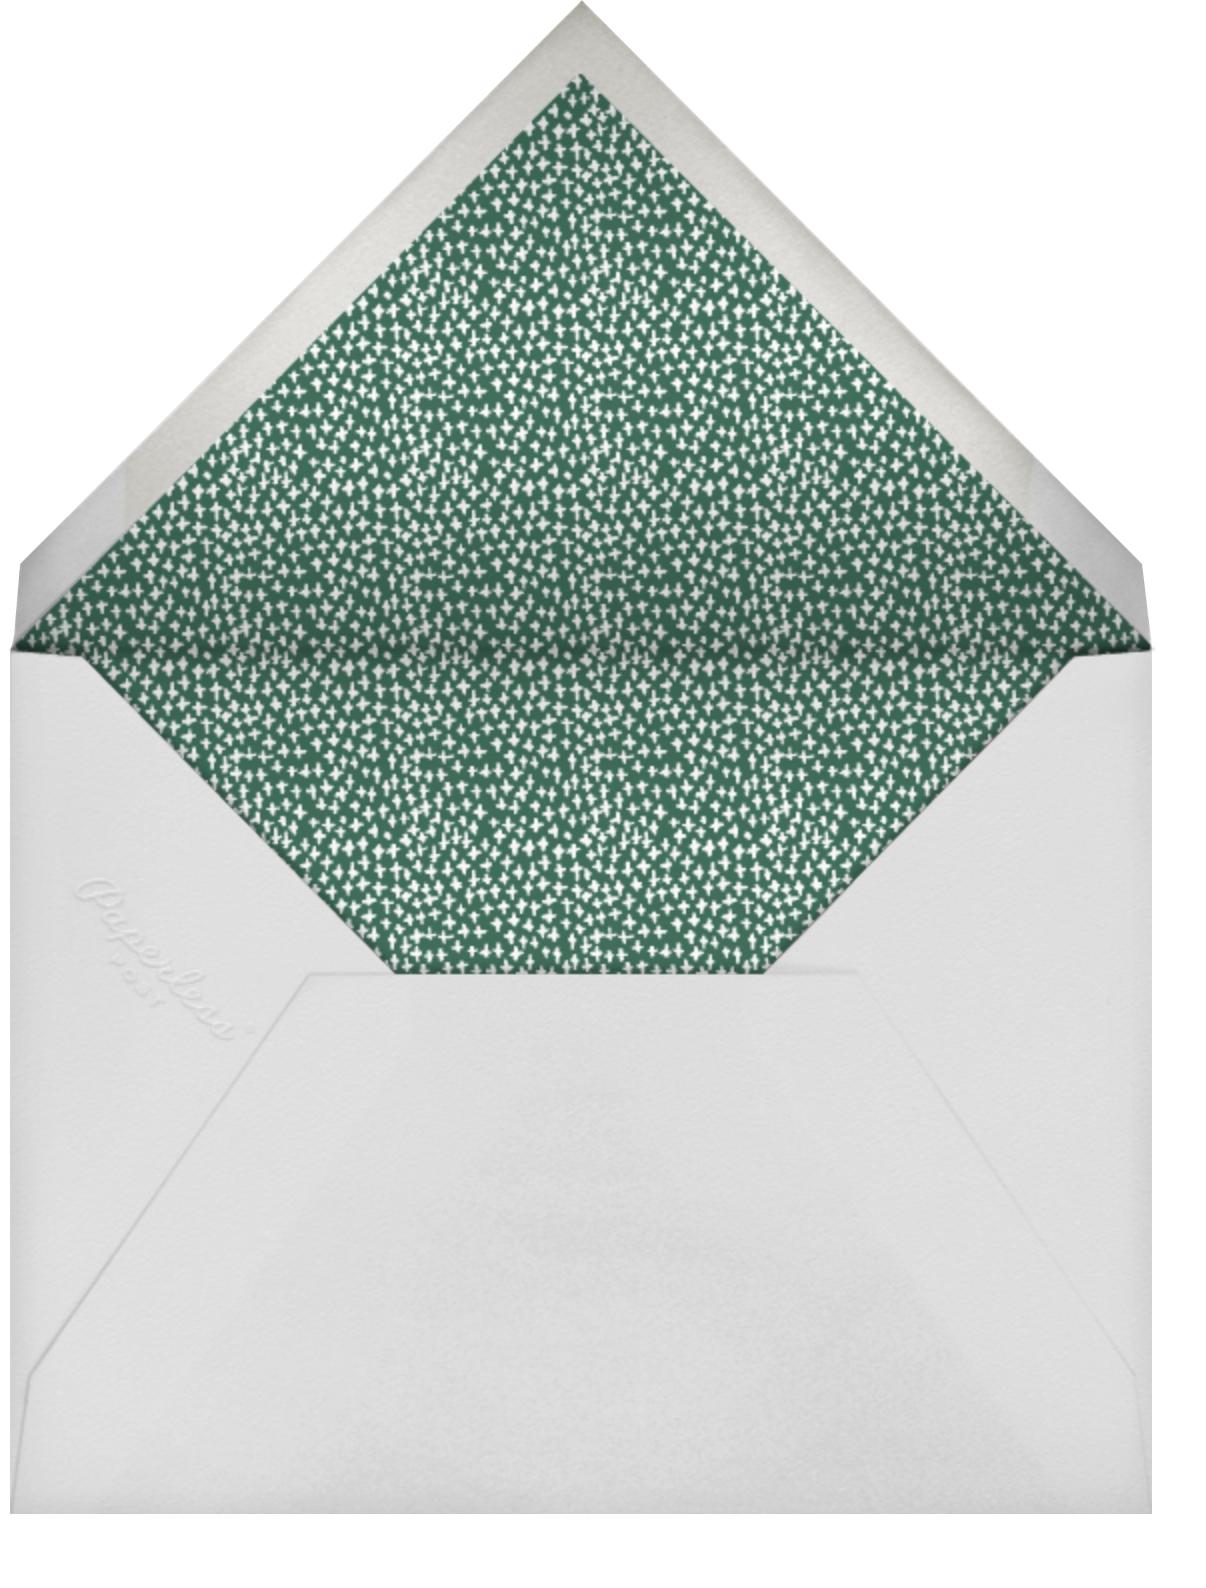 Holly on the Banister (Square Photo) - Red - Mr. Boddington's Studio - Holiday Favorites - envelope back